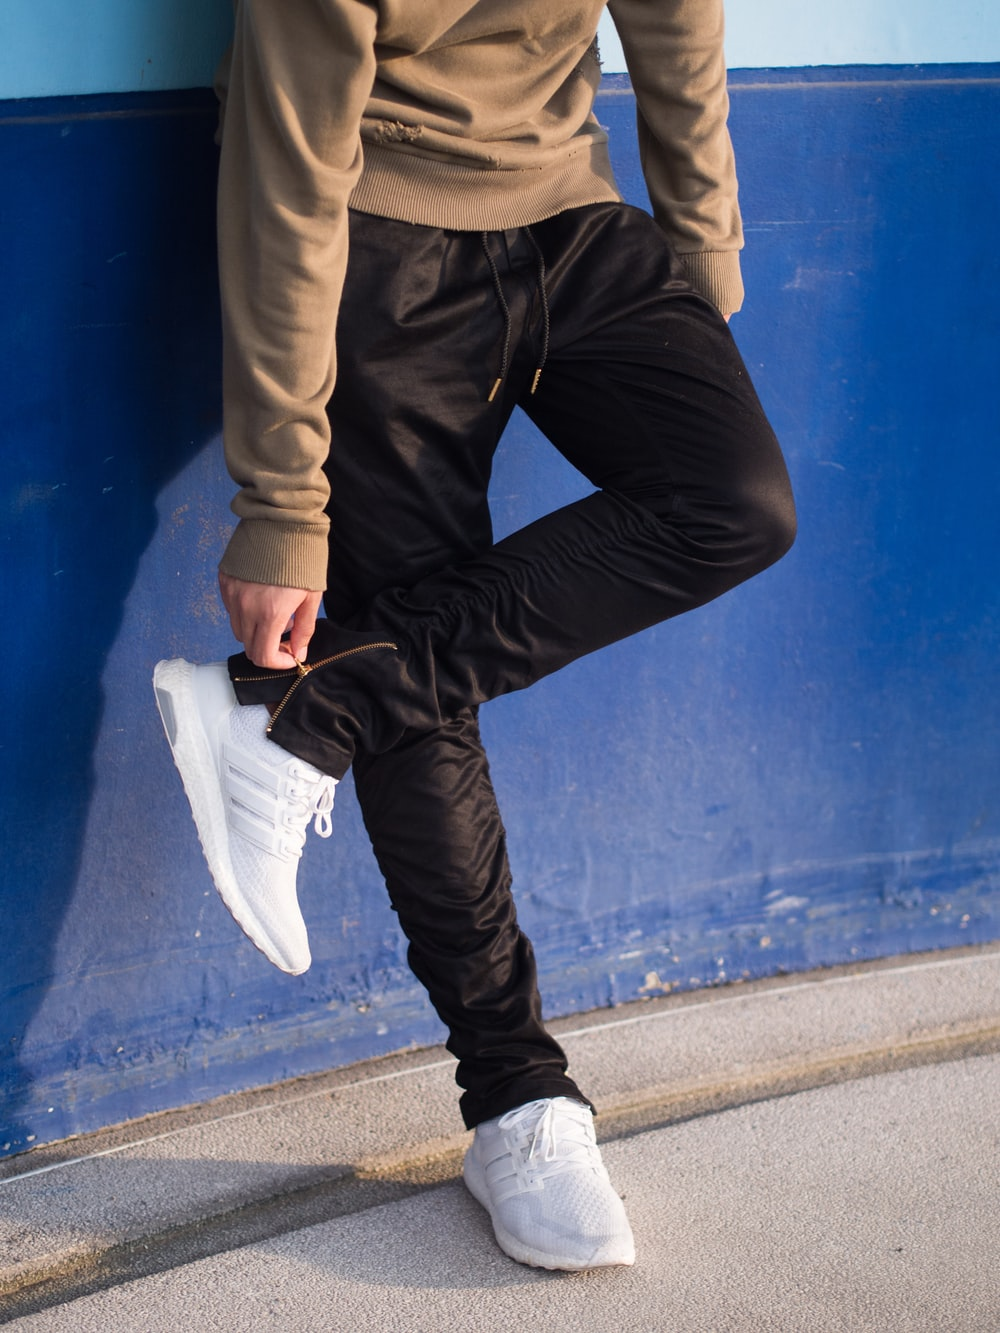 person holding pants zipper